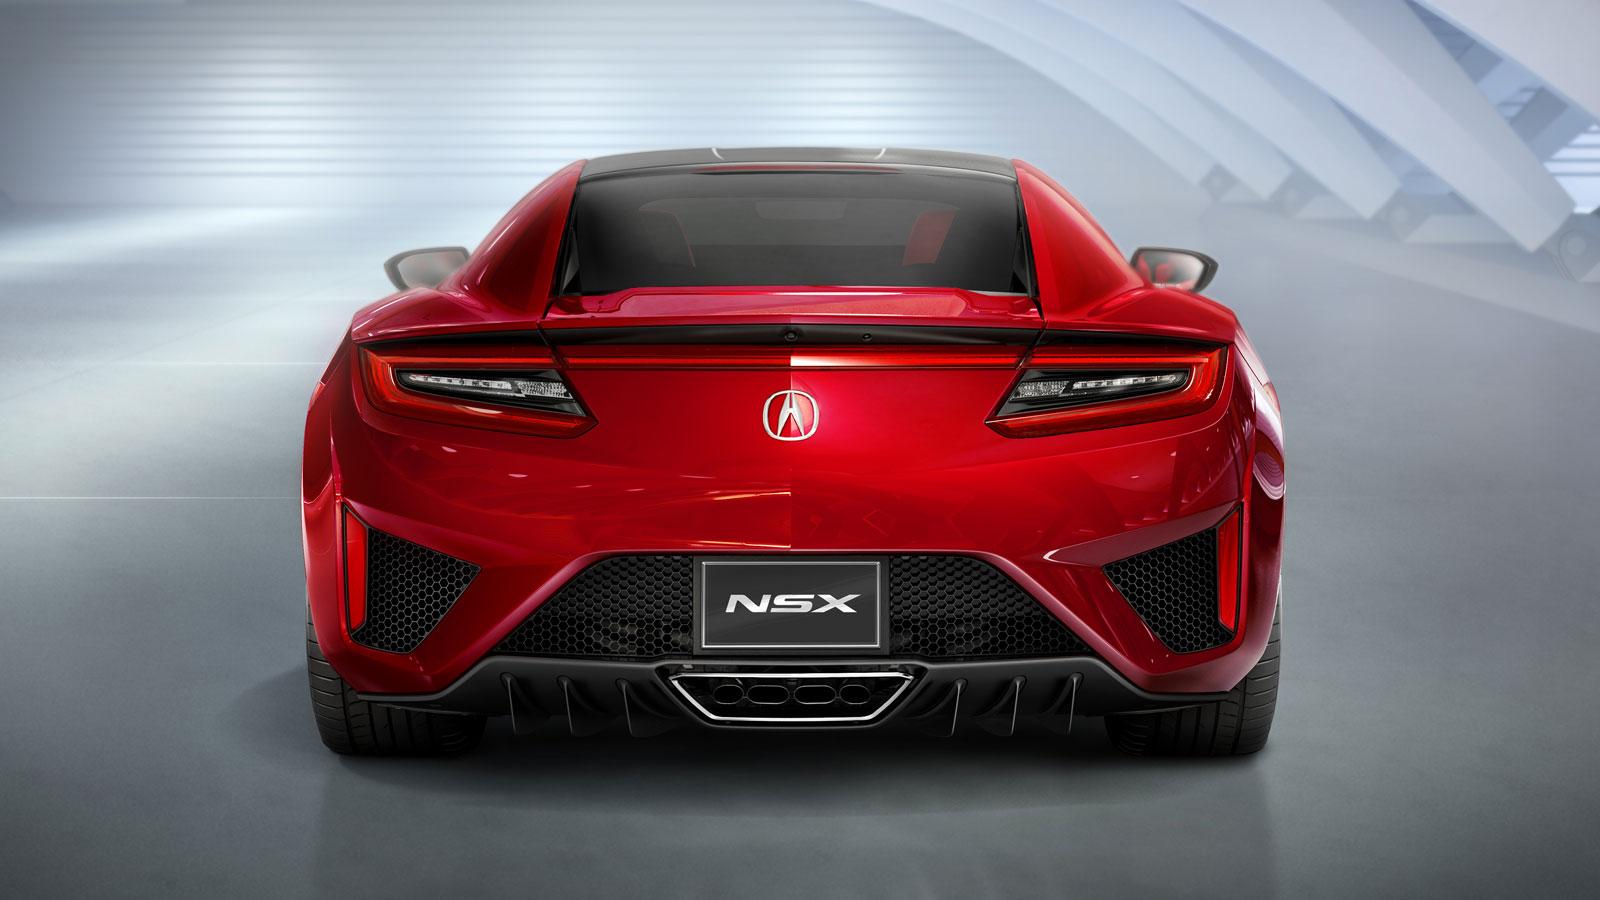 Honda Acura Nsx Car Body Design